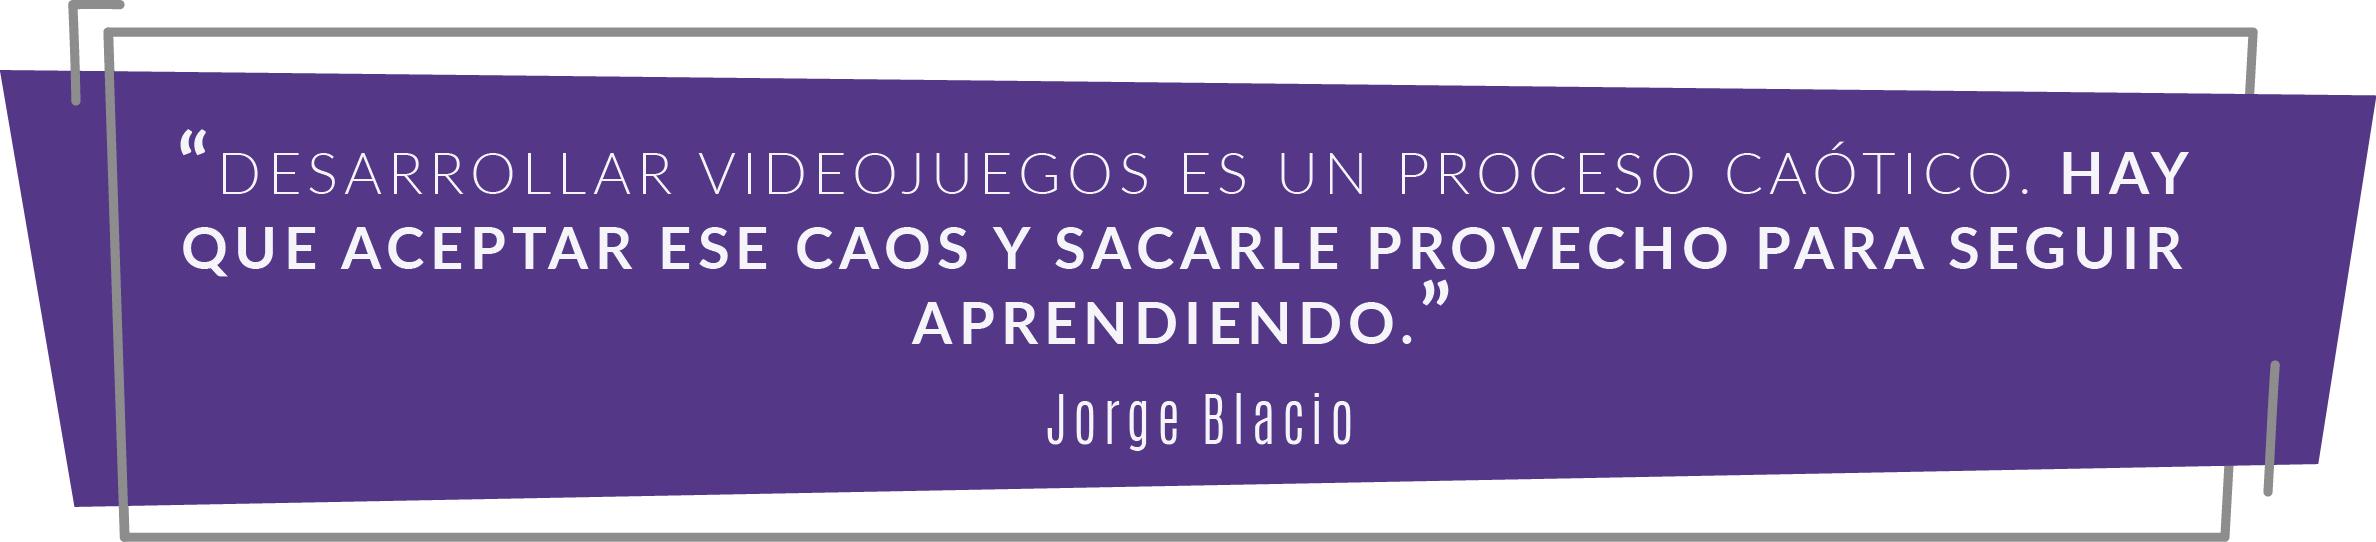 Quotes Jorge Blacio 001